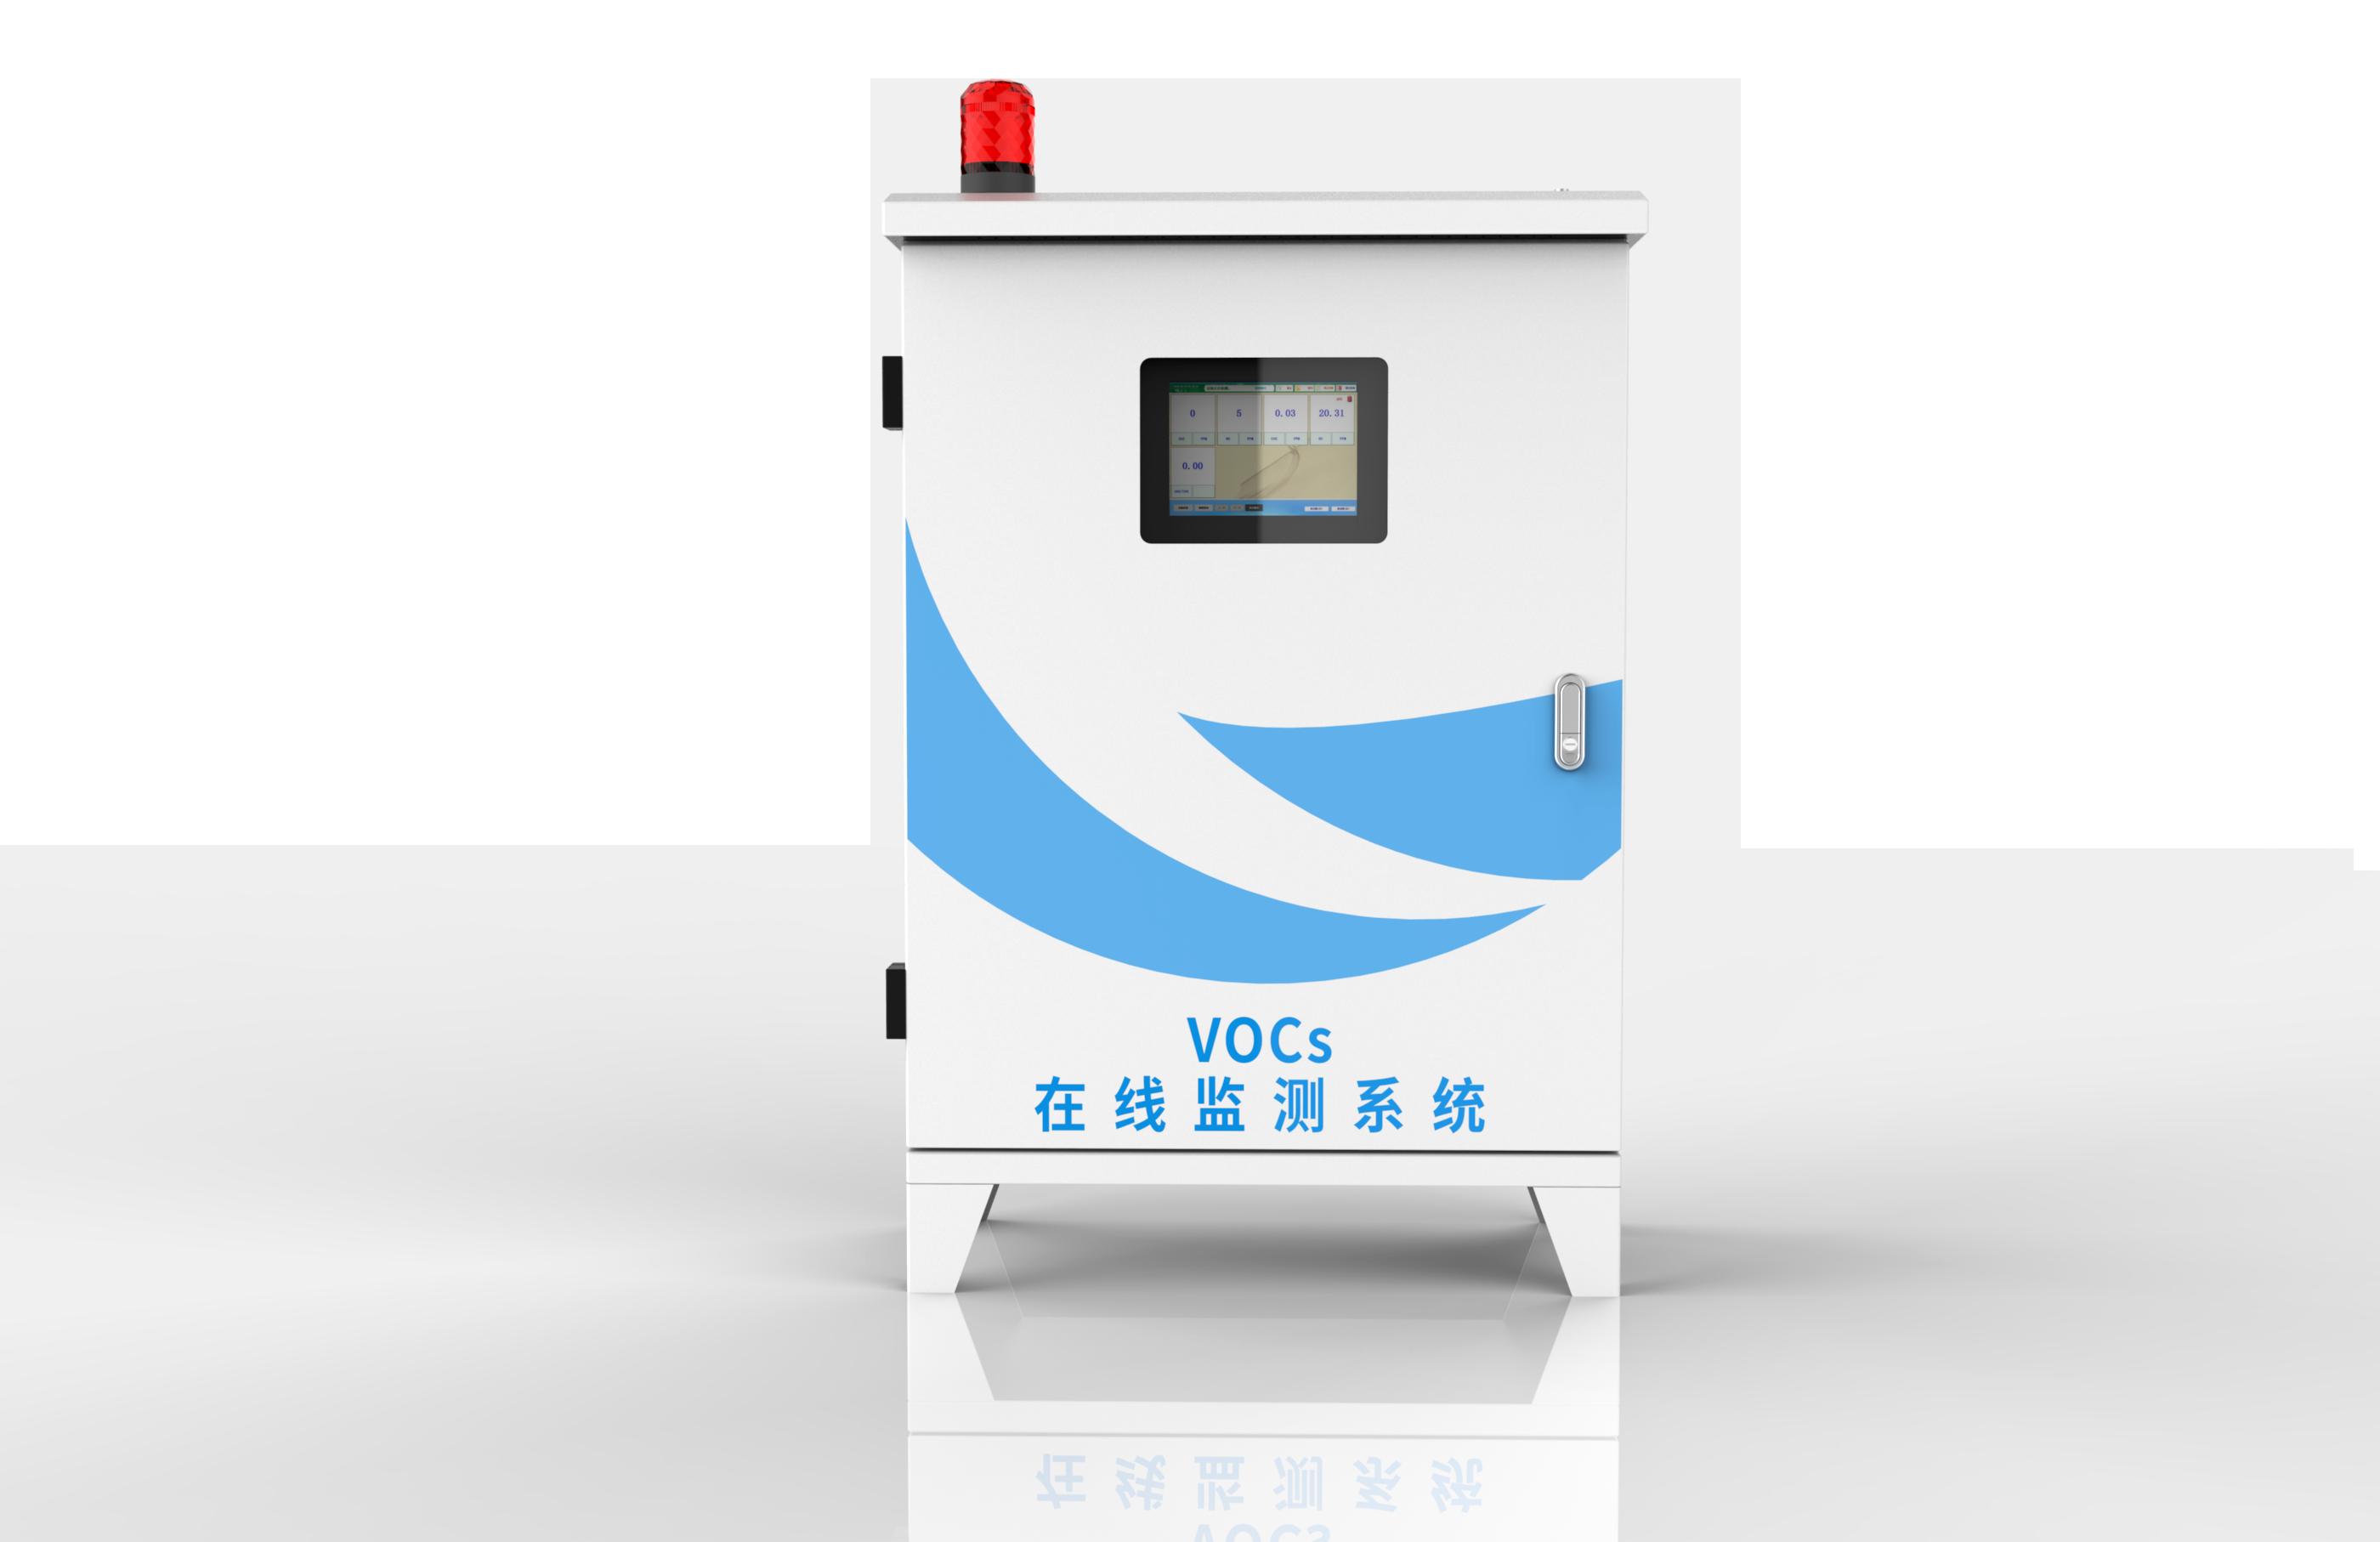 pm10检测仪 郑州PM2.5检测仪粒物、PM10检测仪国家标准、PM2.5\PM10可过质检的